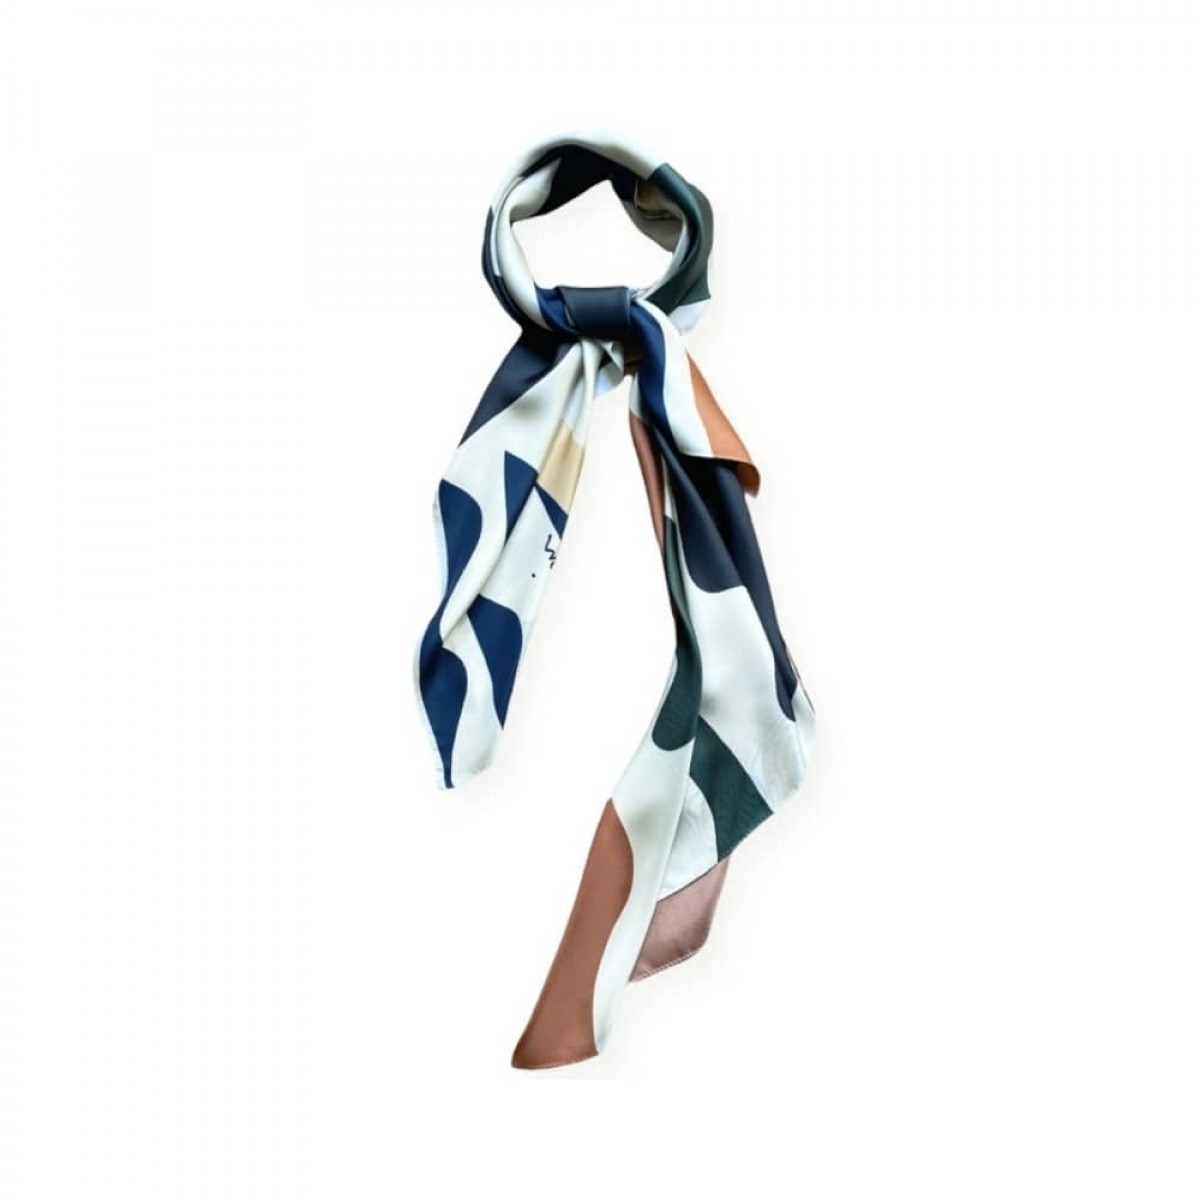 manrique silke tørklæde - kaki - detalje 1